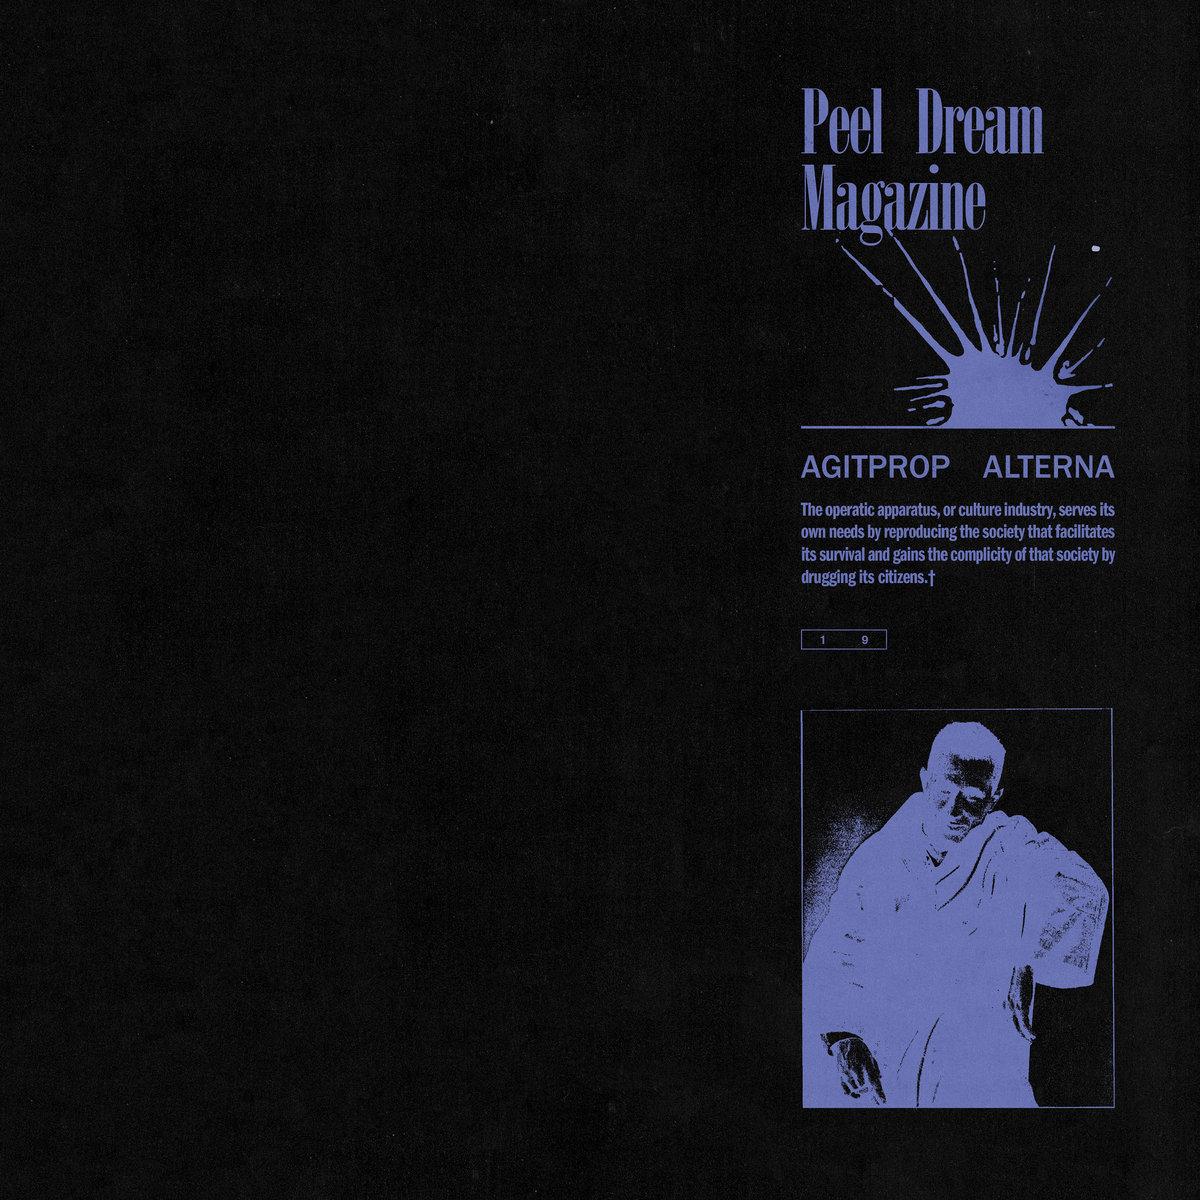 Agitprop Alterna | Peel Dream Magazine